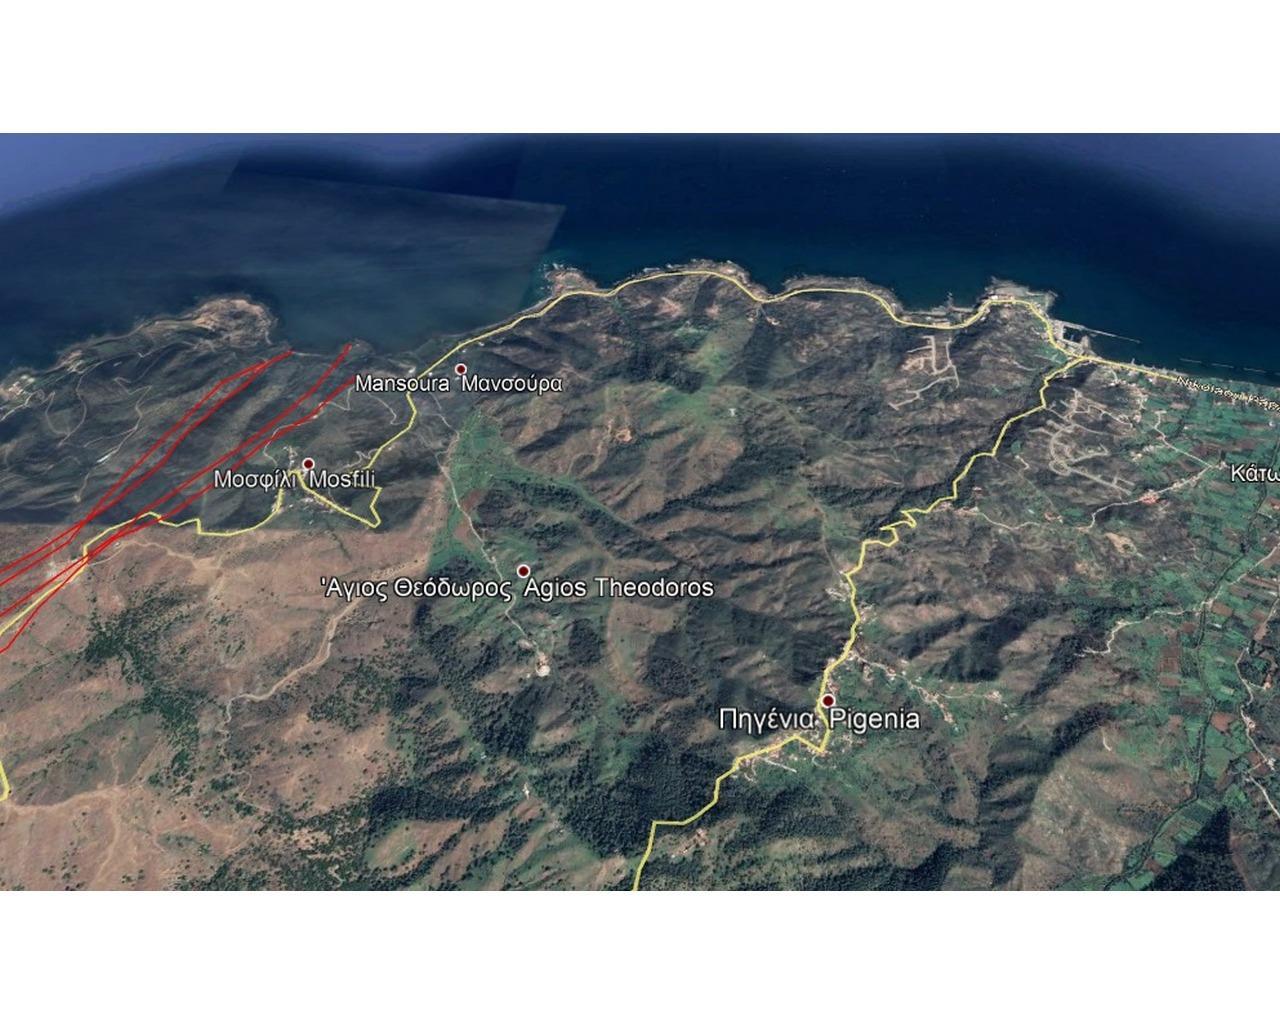 Land Nicosia(Pigenia)  297 SqMt for sale